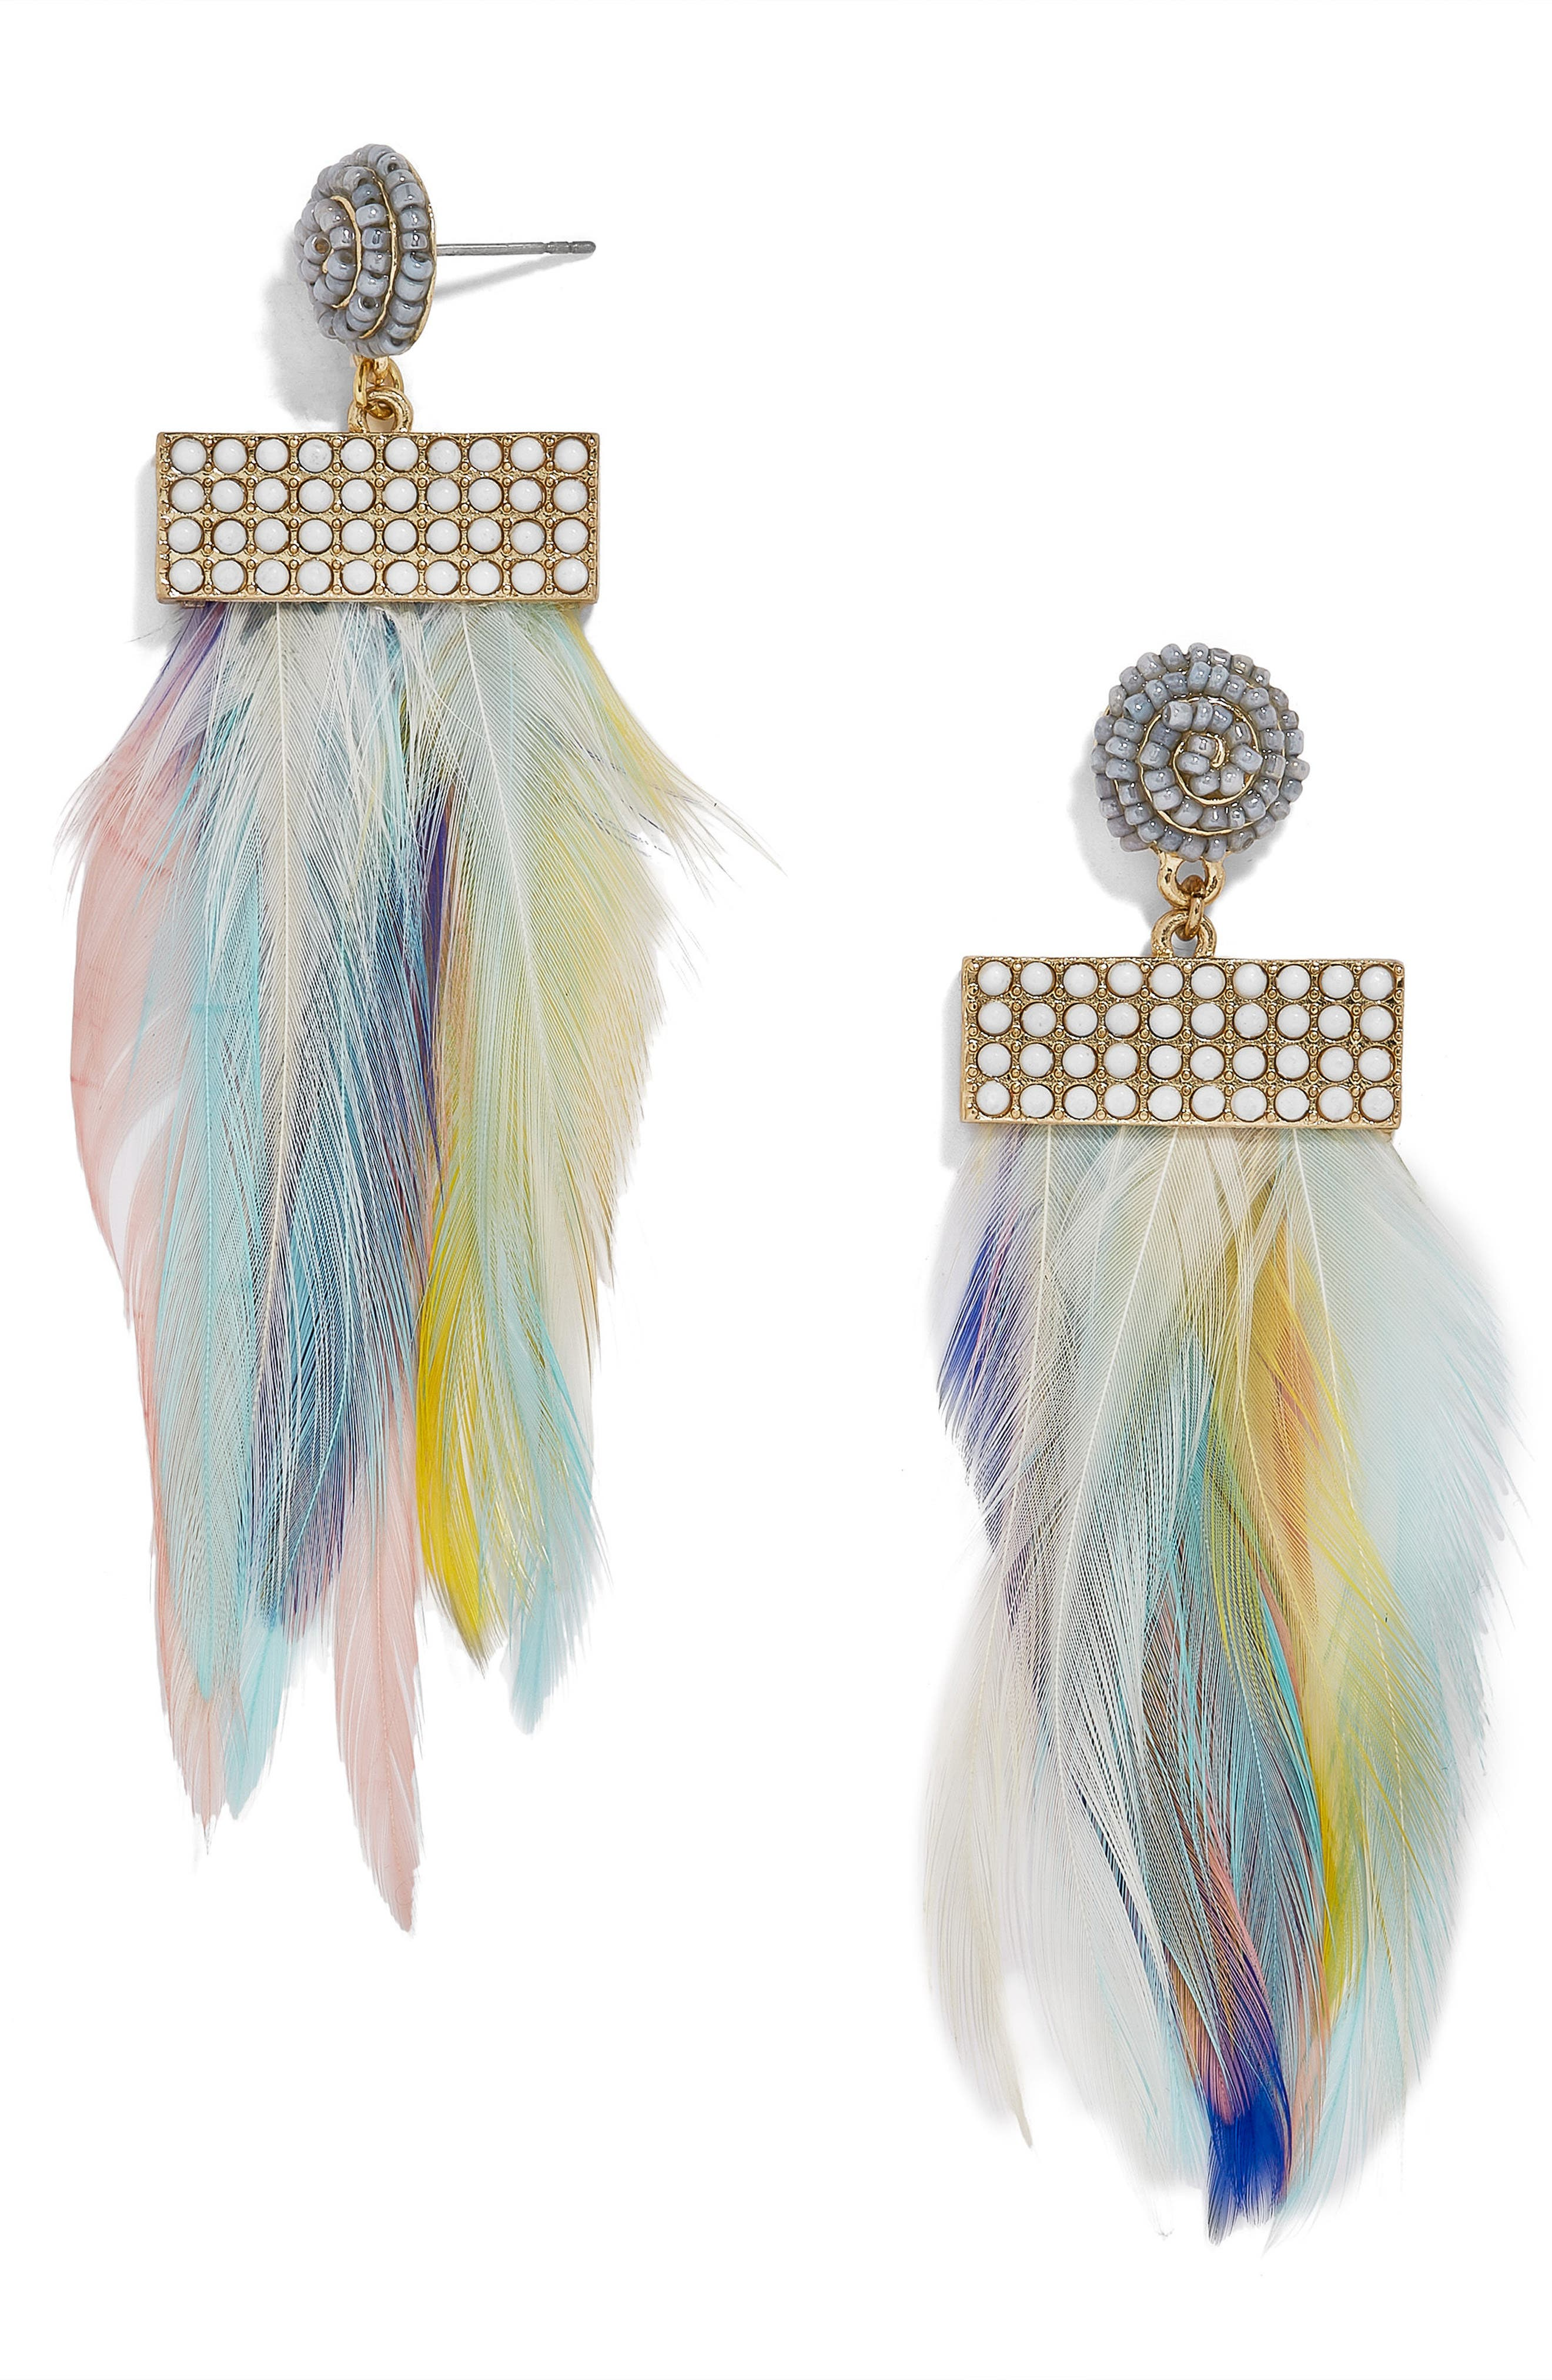 Fluoro Feather Drop Earrings,                             Main thumbnail 1, color,                             400